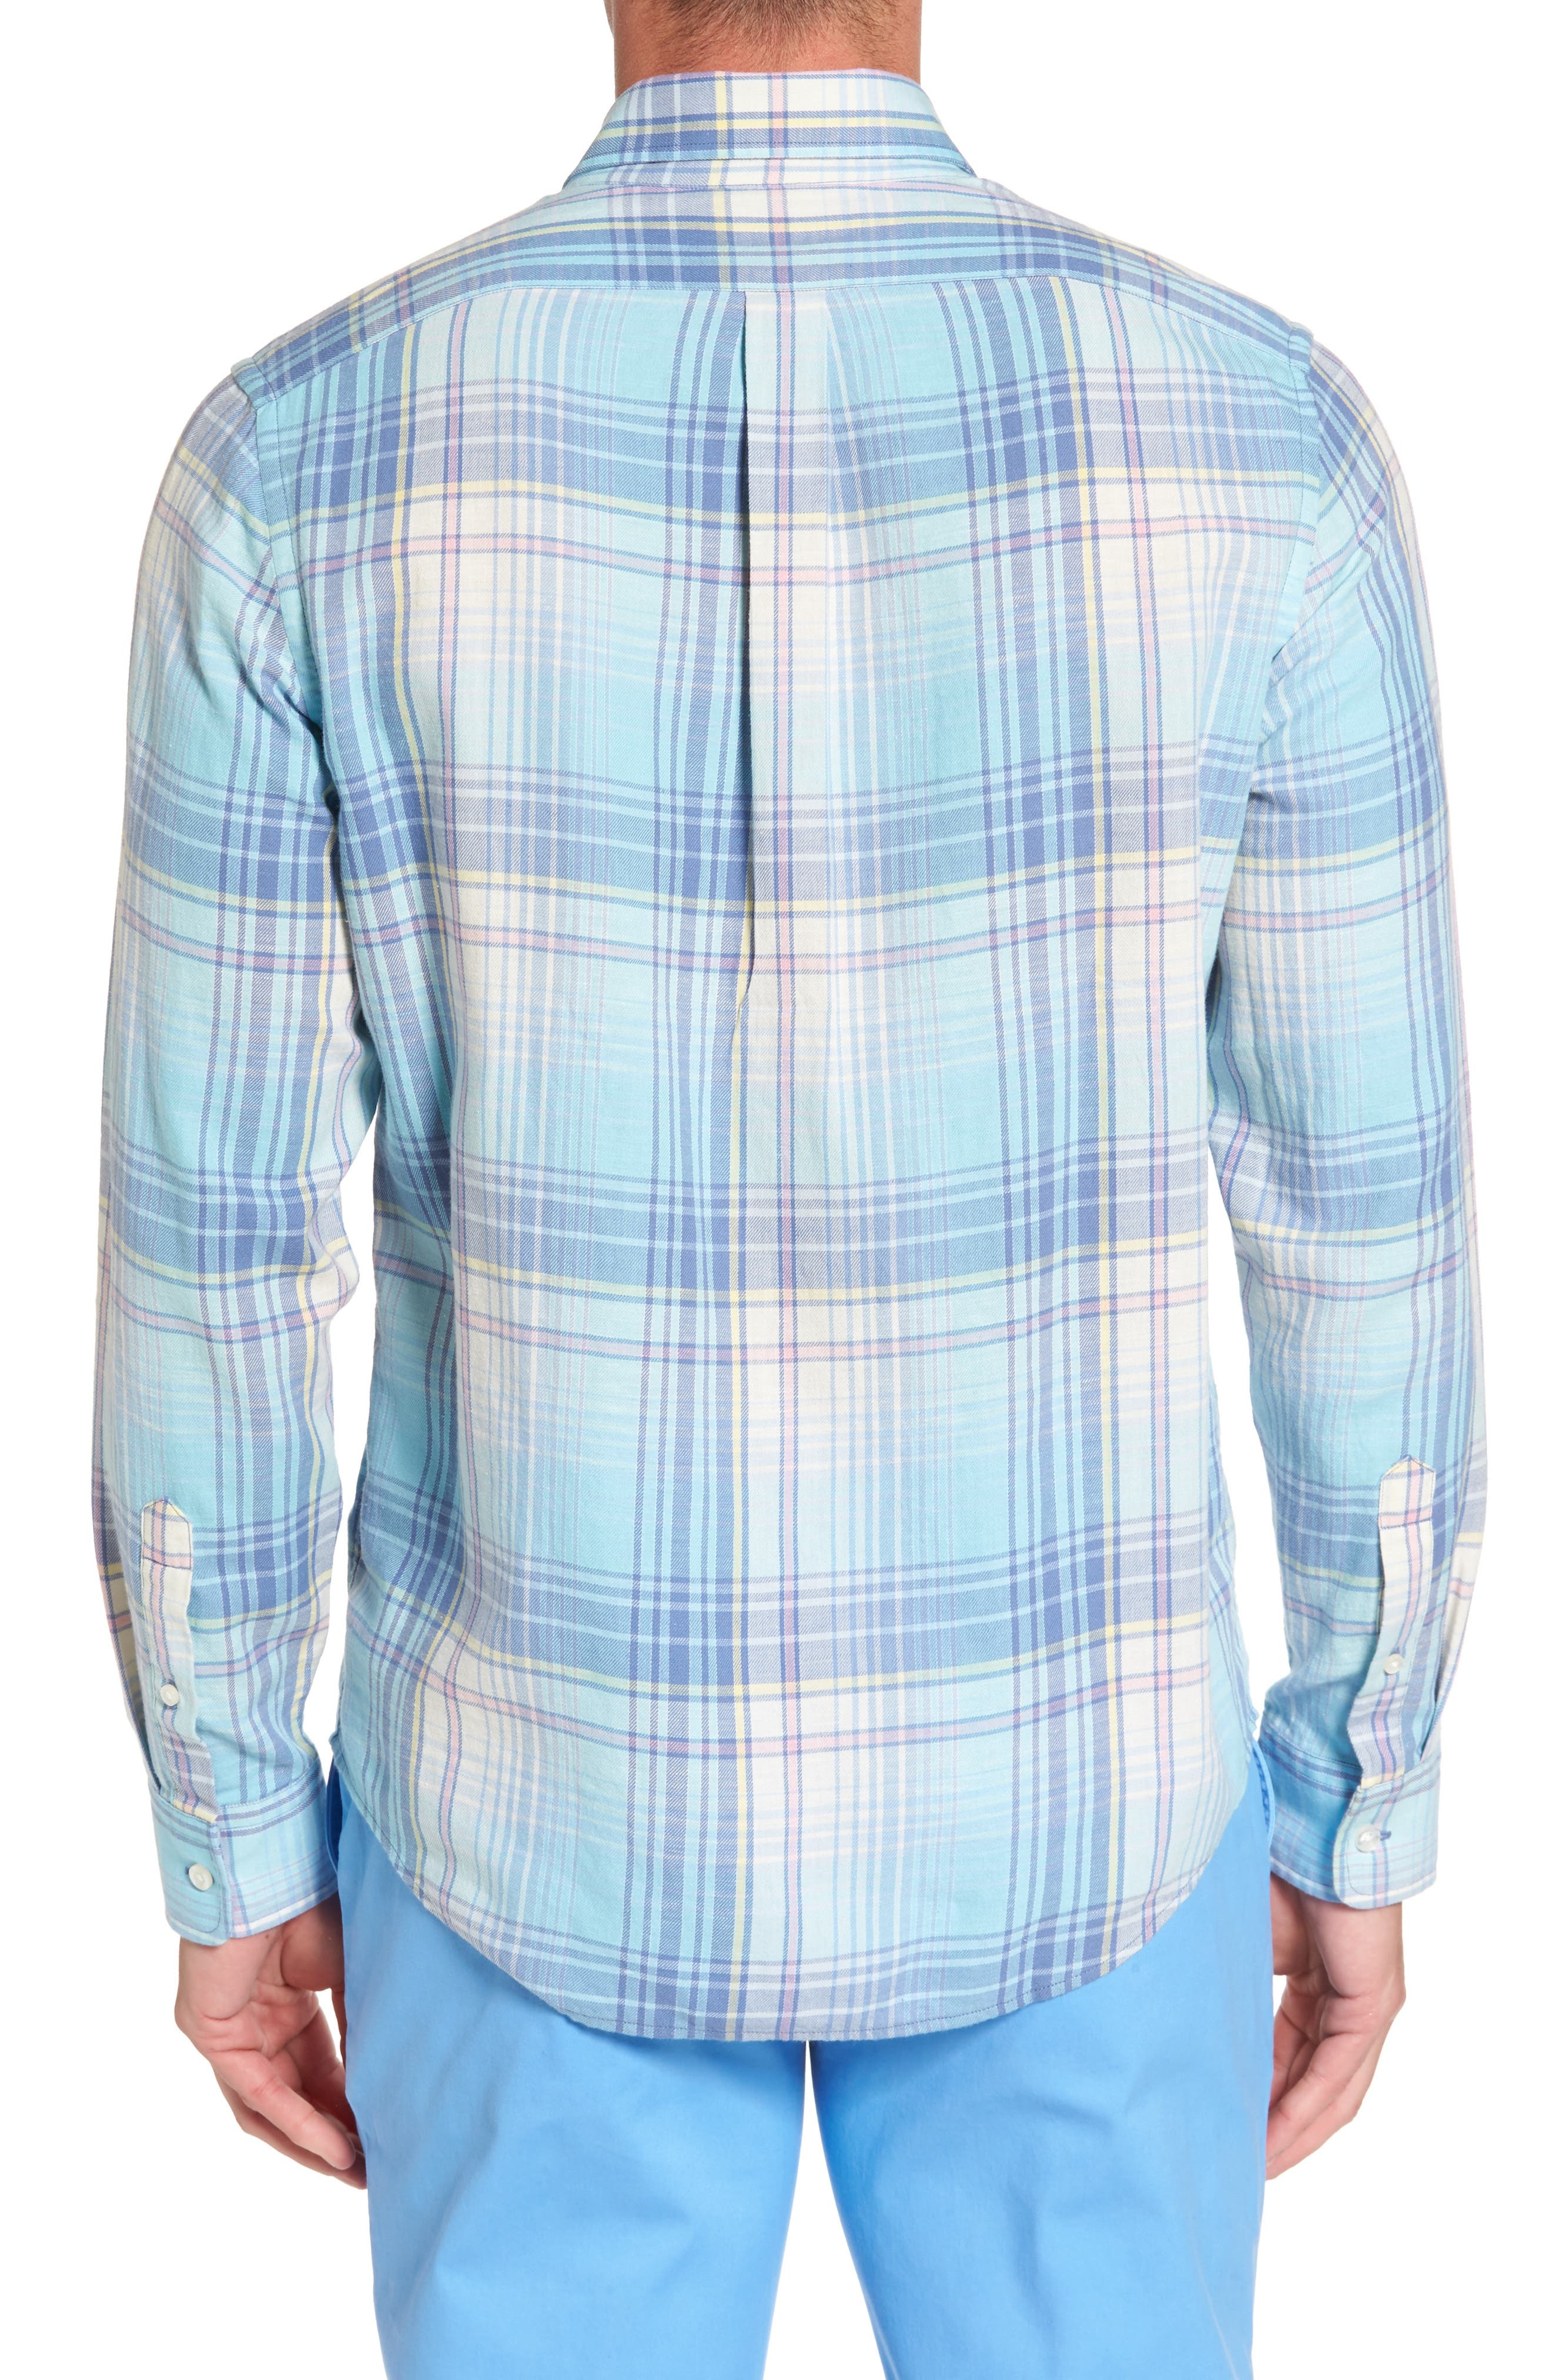 Alternate Image 2  - vineyard vines Pequot Plaid Slim Fit Tucker Sport Shirt